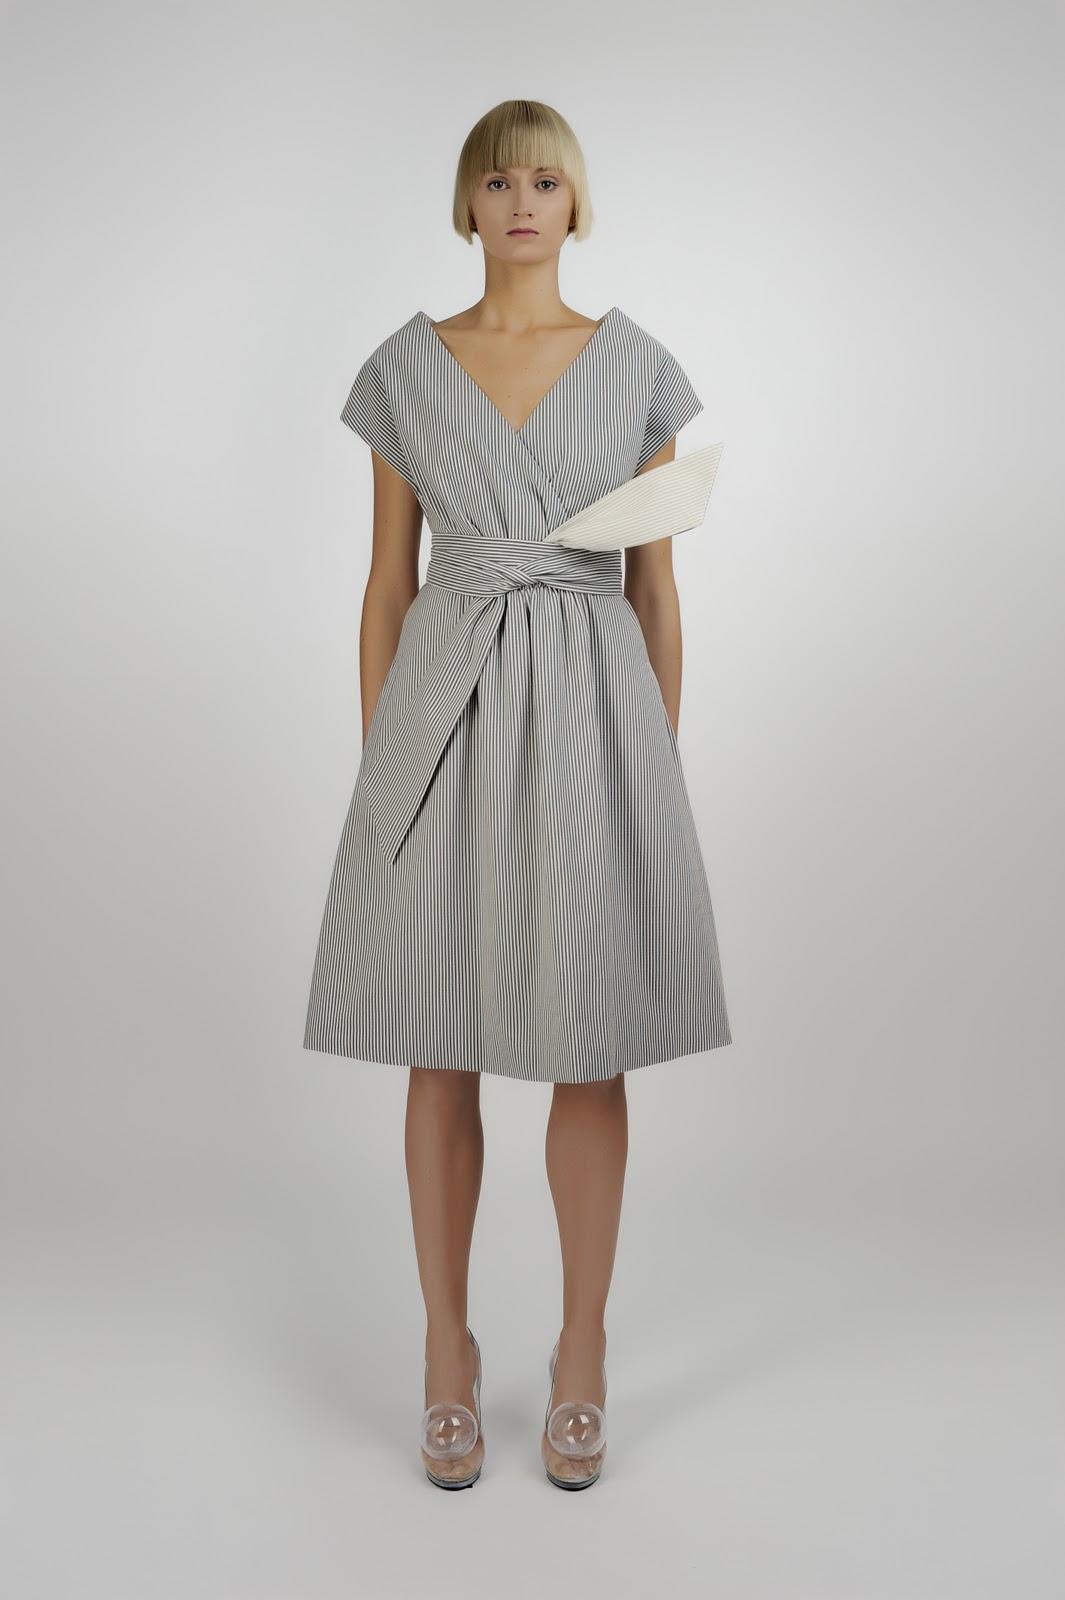 Сарафан из юбки с запахом